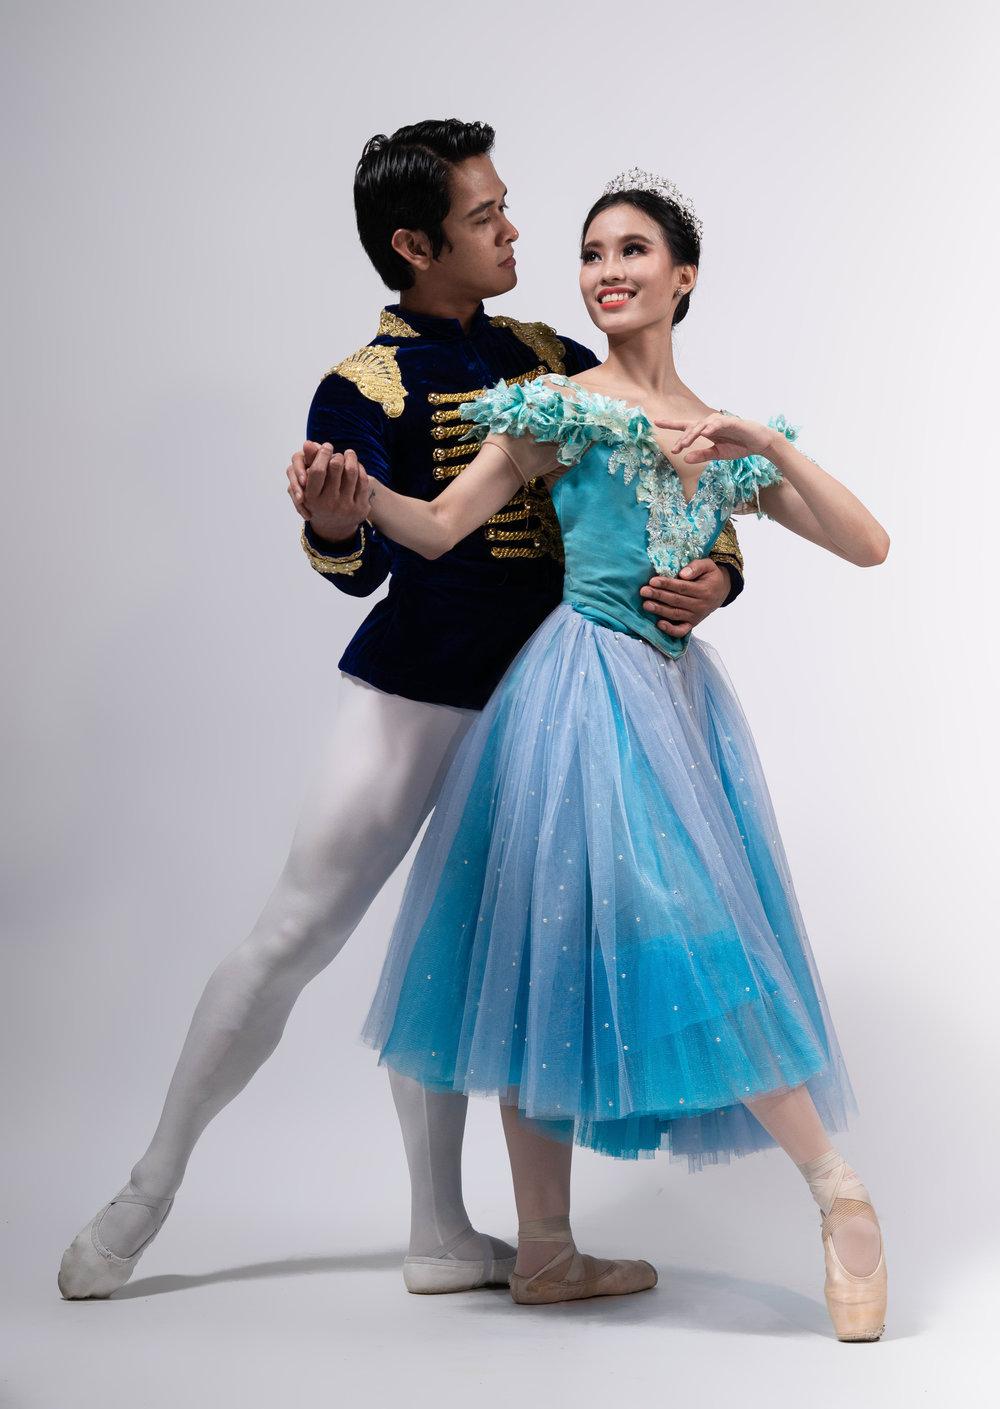 Principal dancer Rudy De Dios returns as Prince Charming, this time with fellow principal dancer Joan Emery Sia as his Cinderella. Photo by MarBi Photography